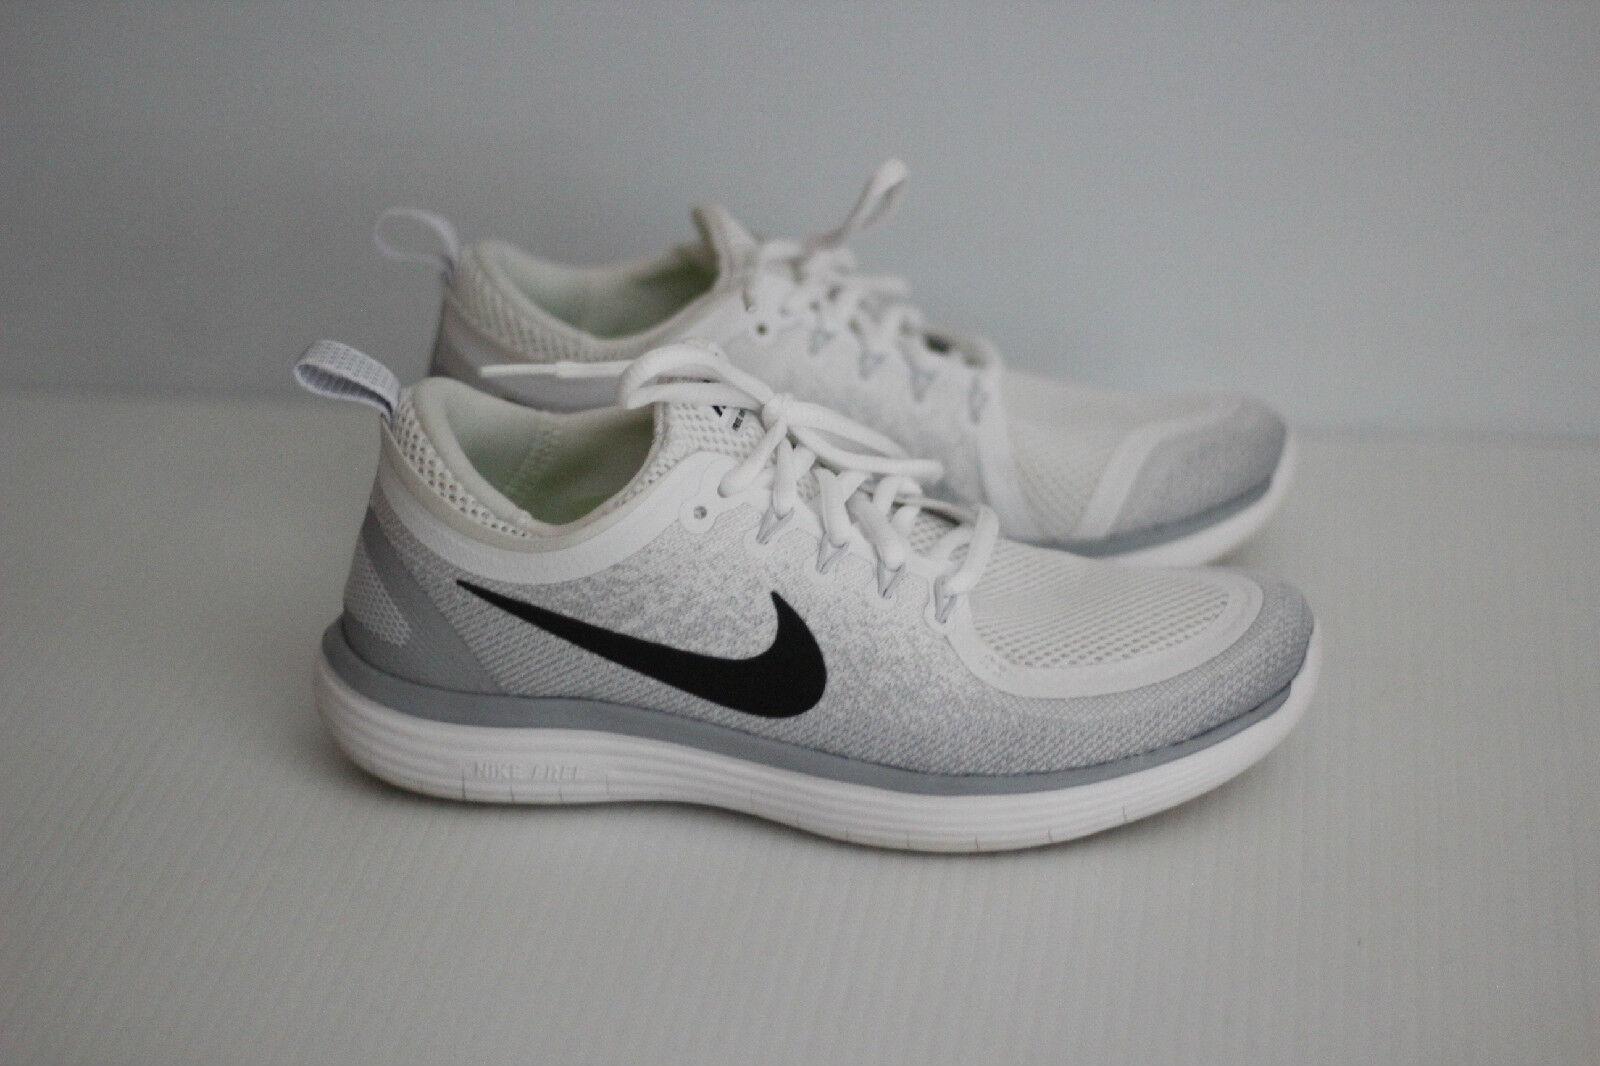 Nike Free RN Distance 2 Running Shoe- White/Black/Pure Platinum/Wolf Grey - 8 US